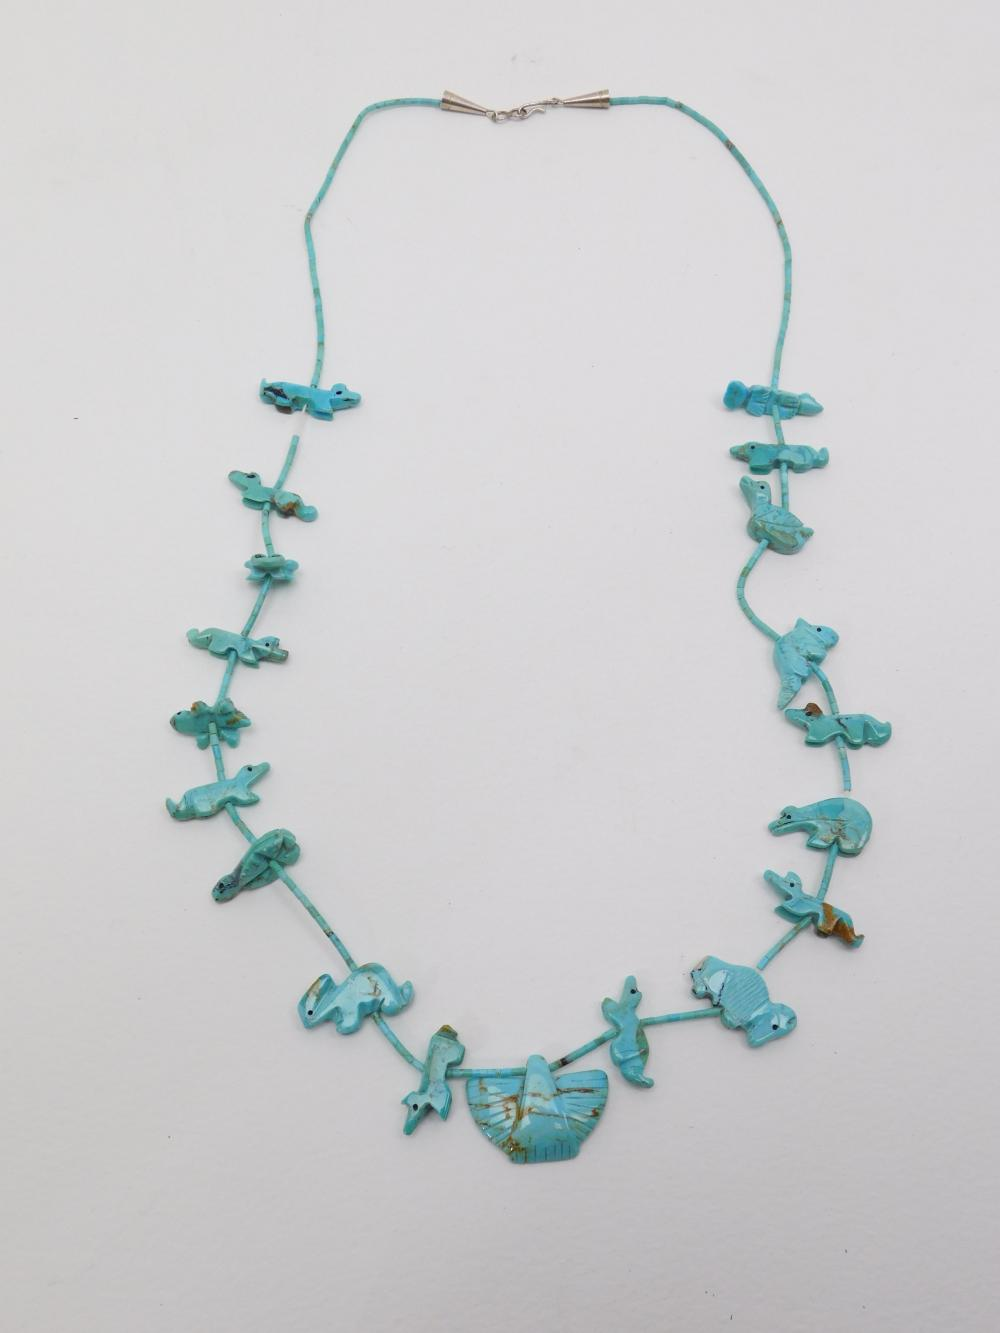 Vintage Native American Turquoise Carved Animal Fetish Becklace 28G